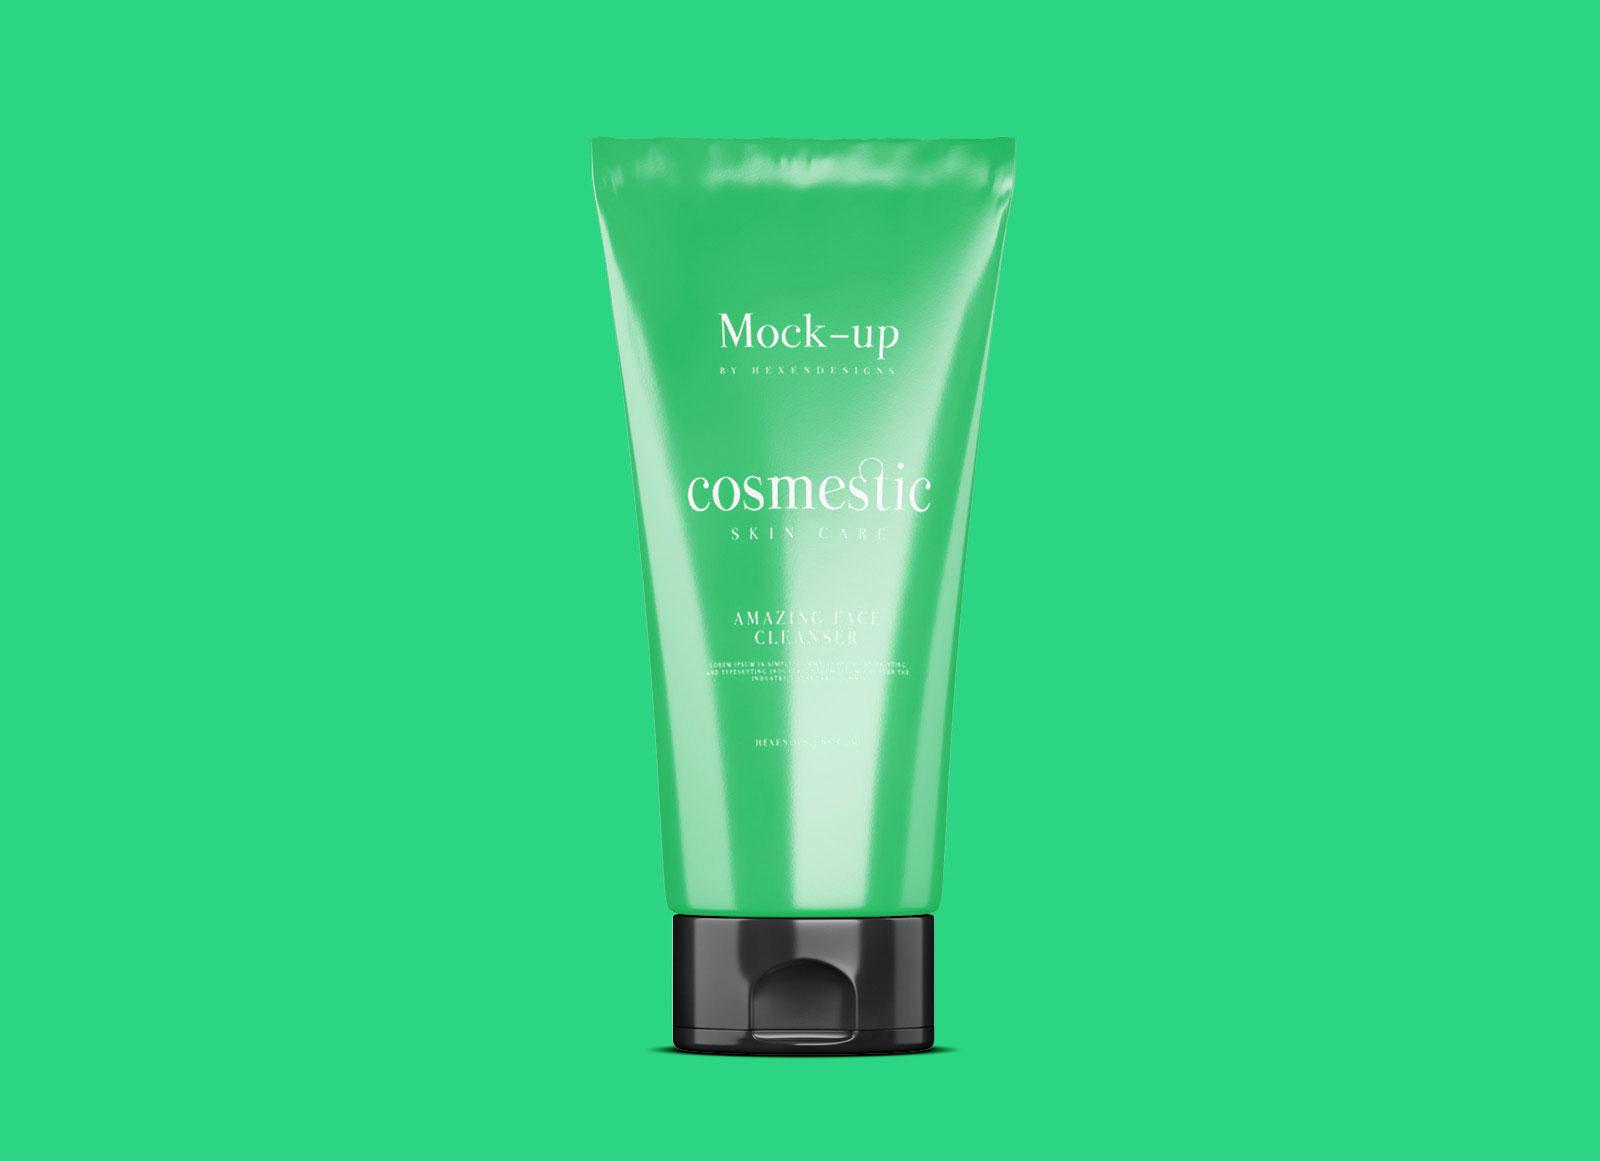 Free-Cosmetic-Cream-Tube-Mockup-PSD-3